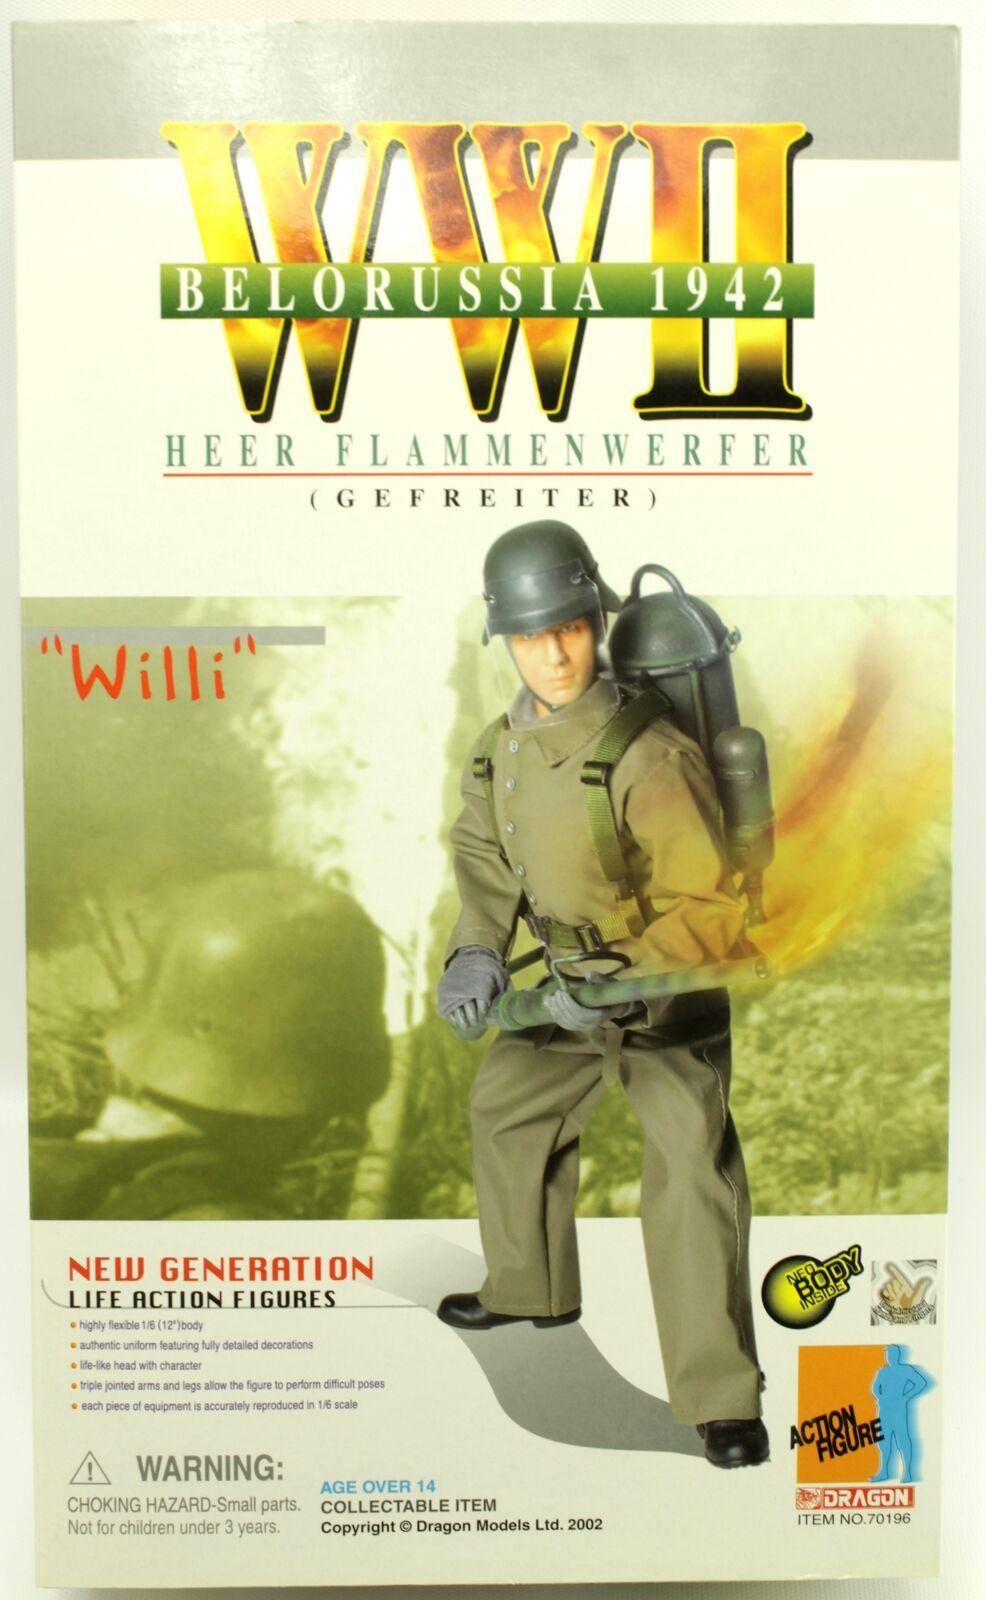 WWII Willi Heer Flammenwerfer Belorussia 1942 Dragon 12